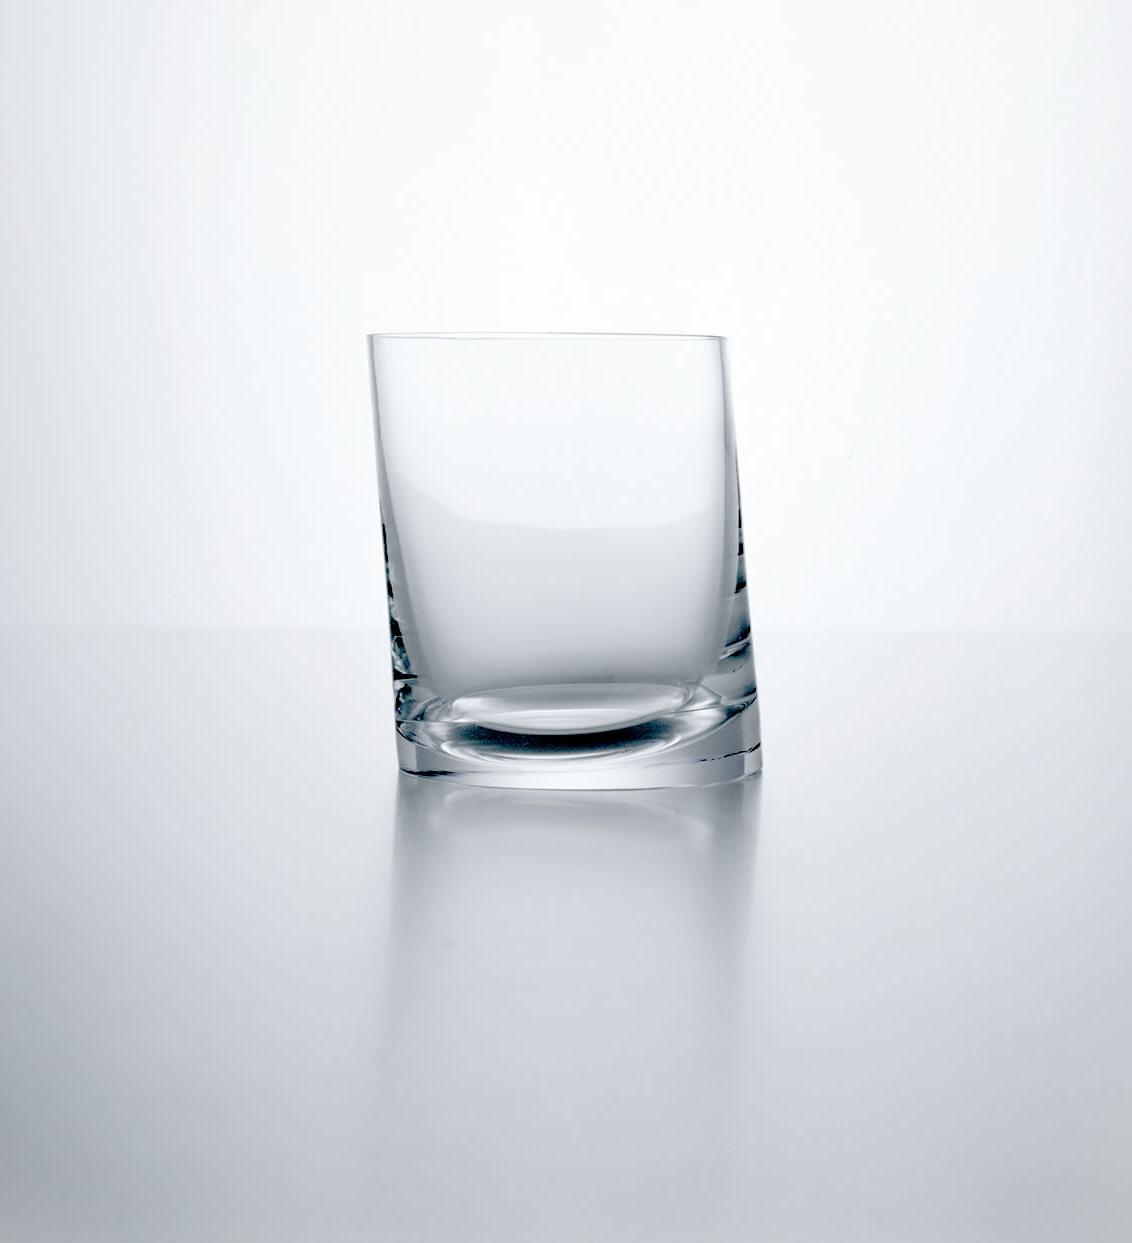 lucyd_SCOTT_glass_5_hochkant Kopie